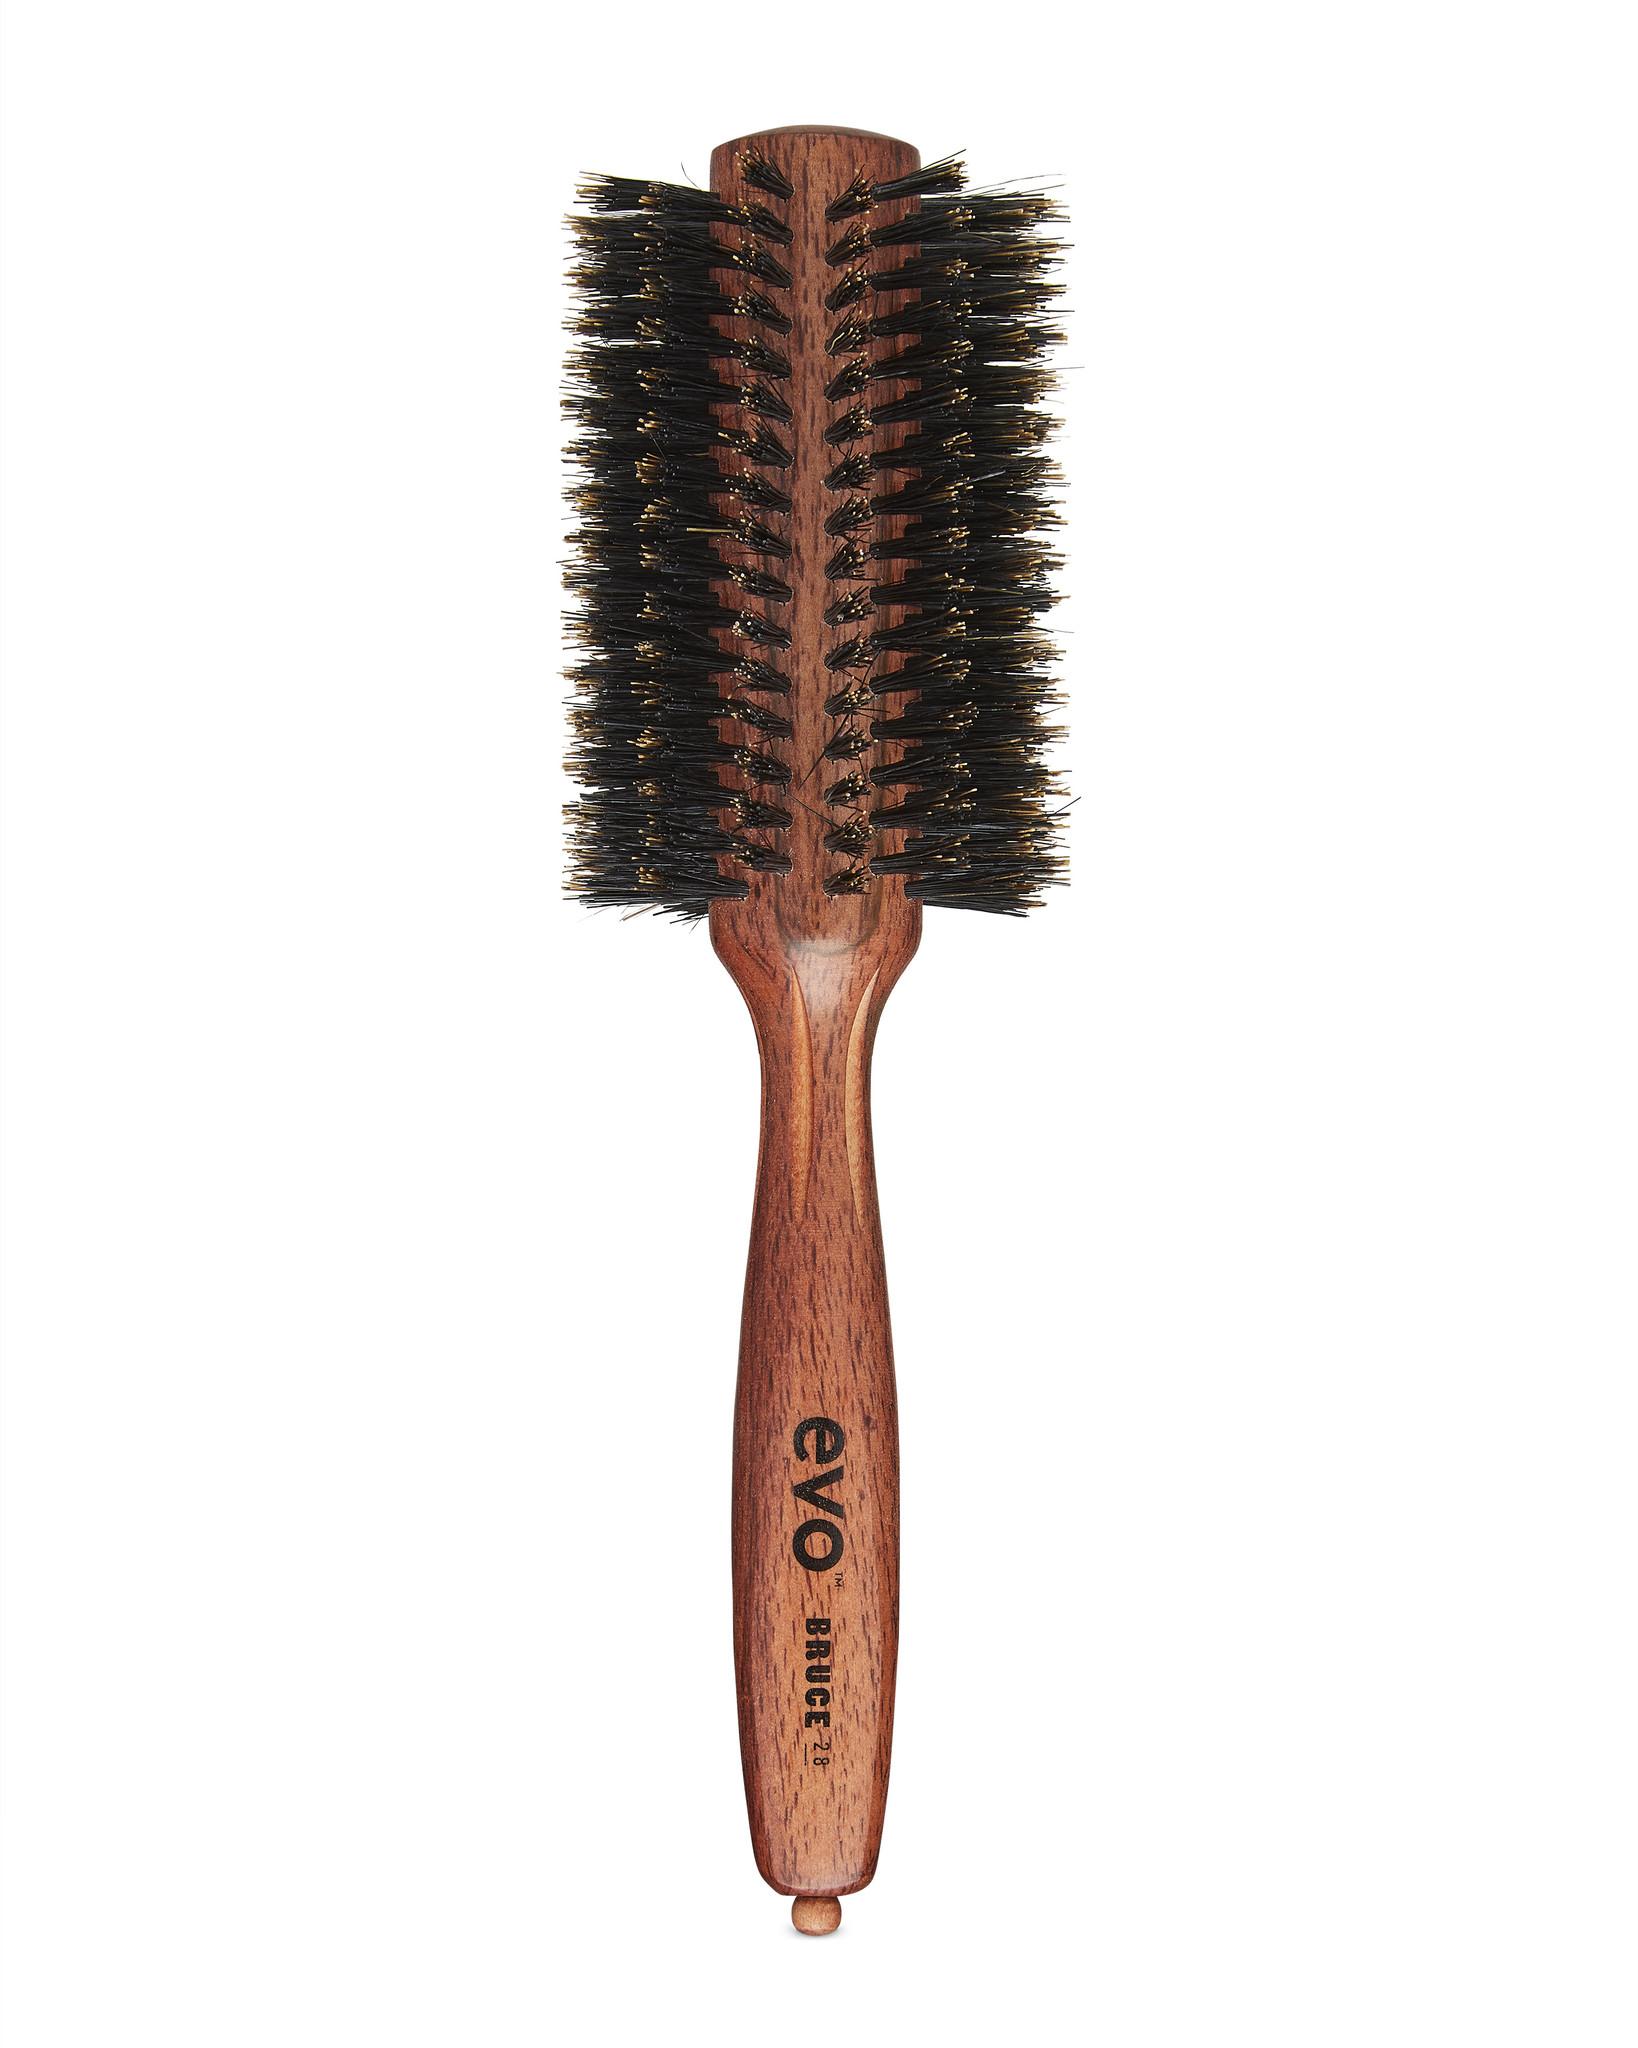 EVO Brosse BRUCE ronde à poils de sanglier naturels 28 mm